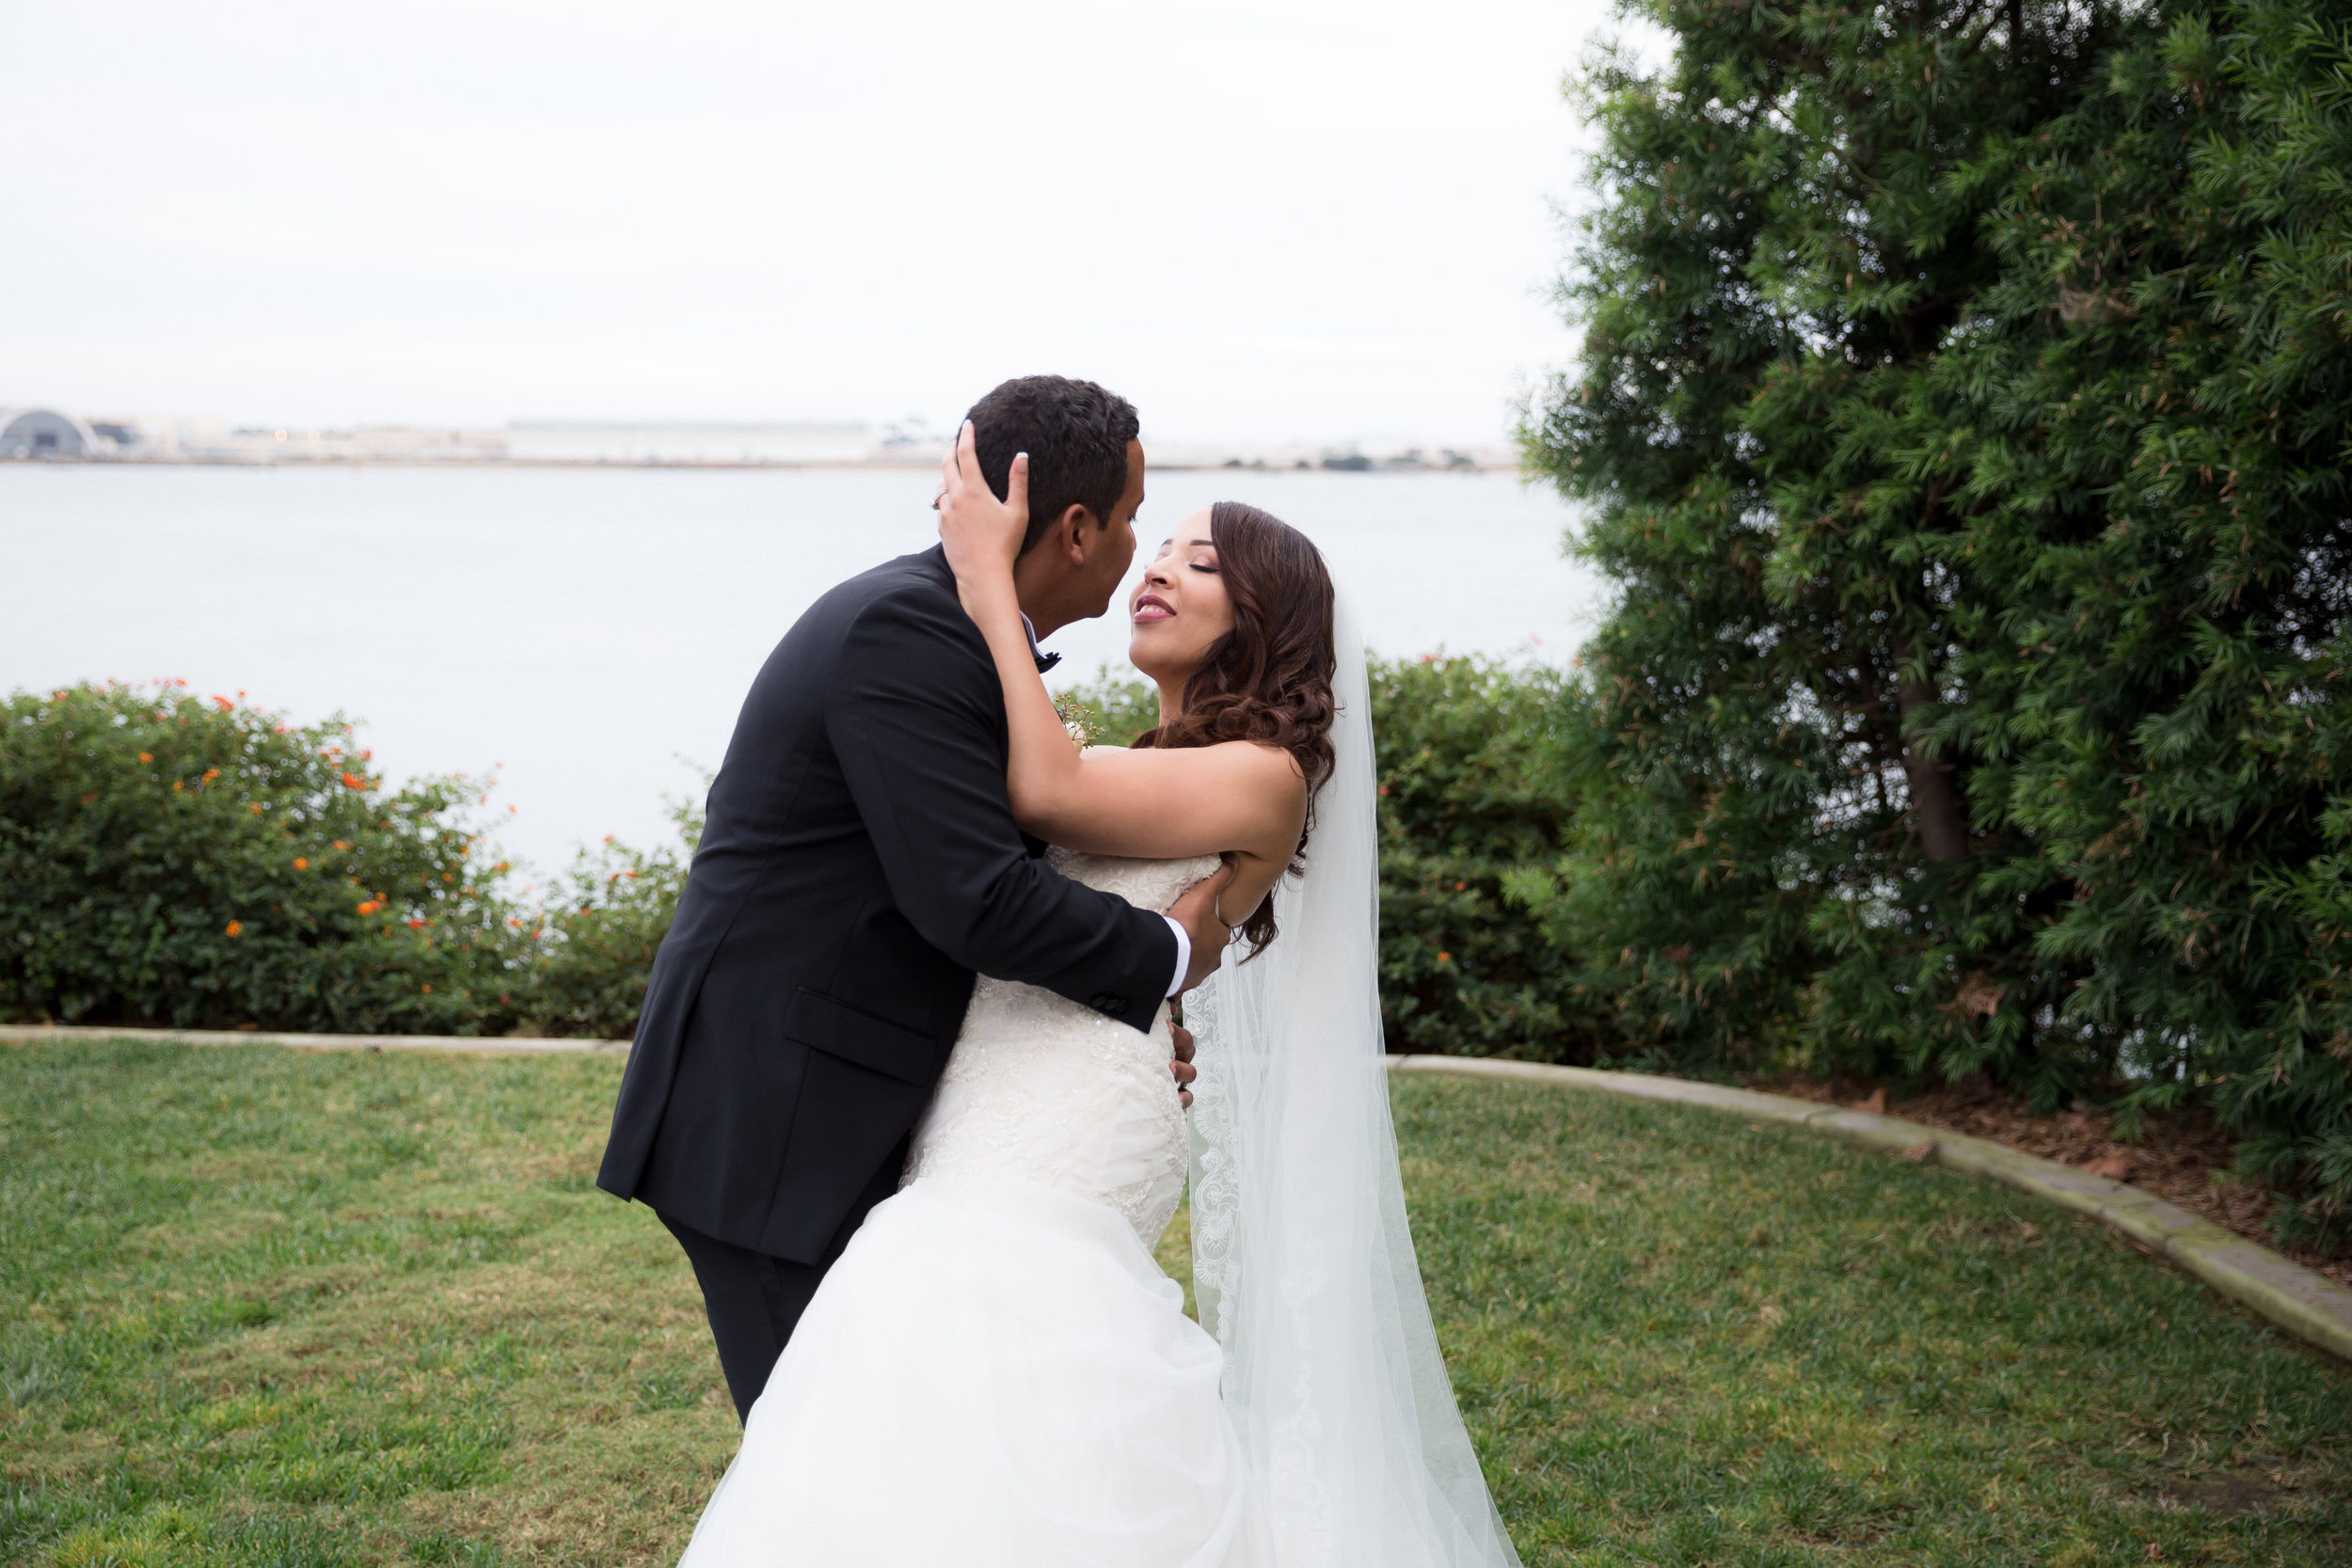 Jillian_Stargell_Tom_Hams_Lighthouse_Wedding_410.jpg